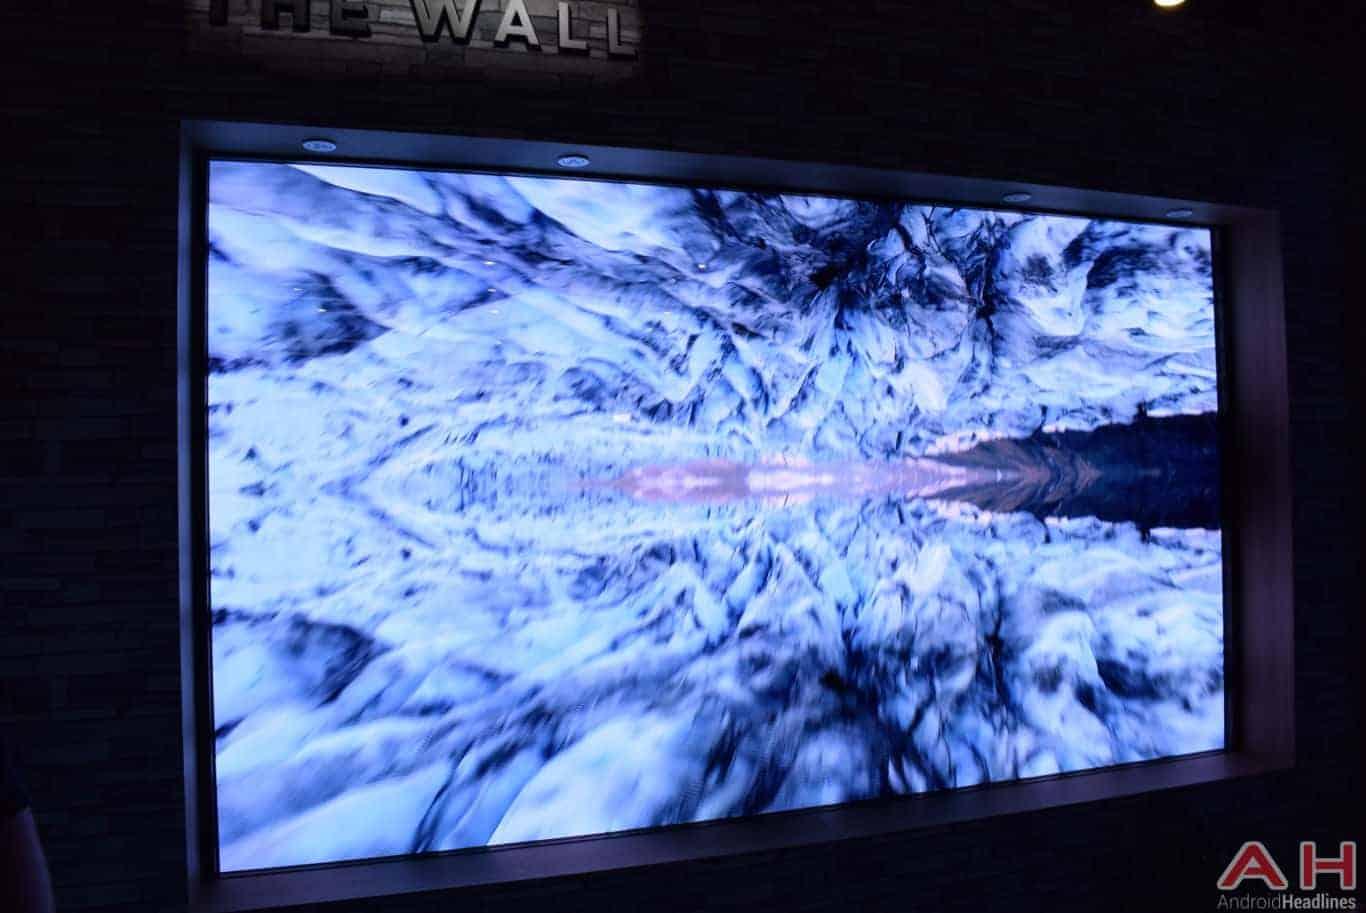 Samsung The Wall Modular MicroLED TV CES 2018 AH 8